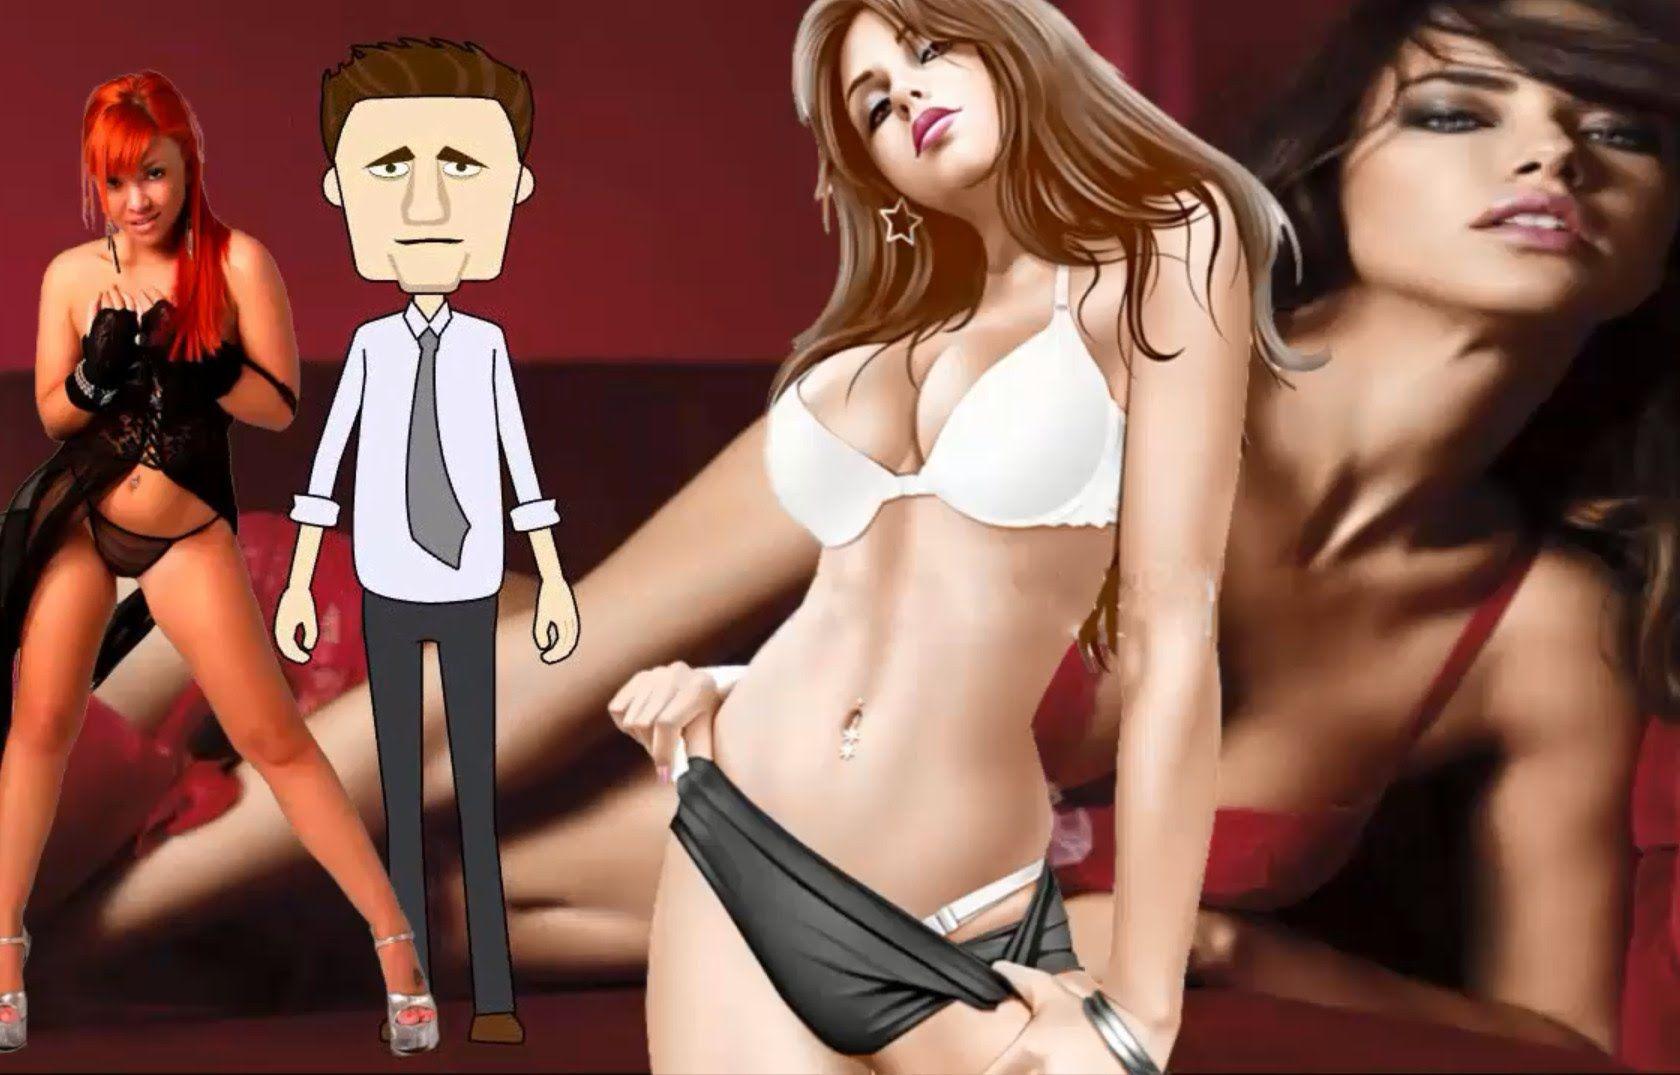 Секс nbsp з nbsp брюнетками